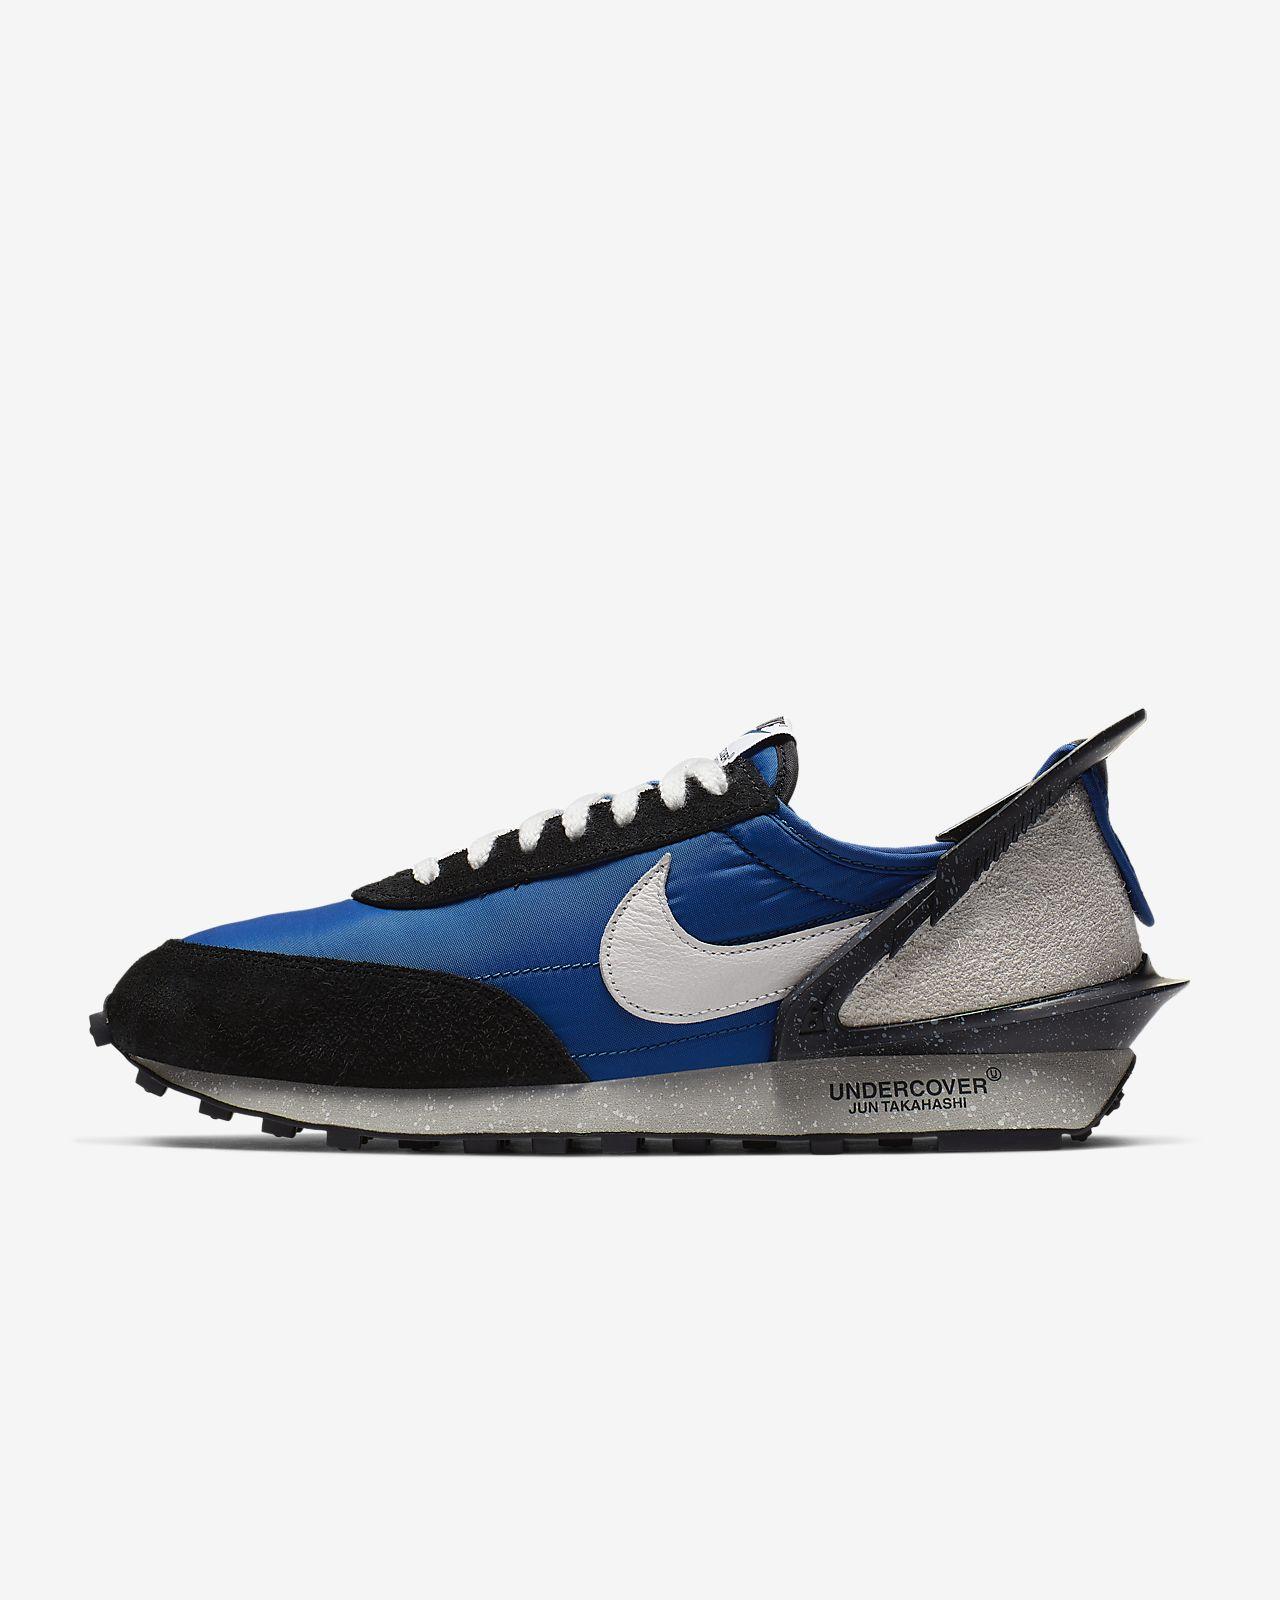 Nike x Undercover Daybreak Men's Shoe